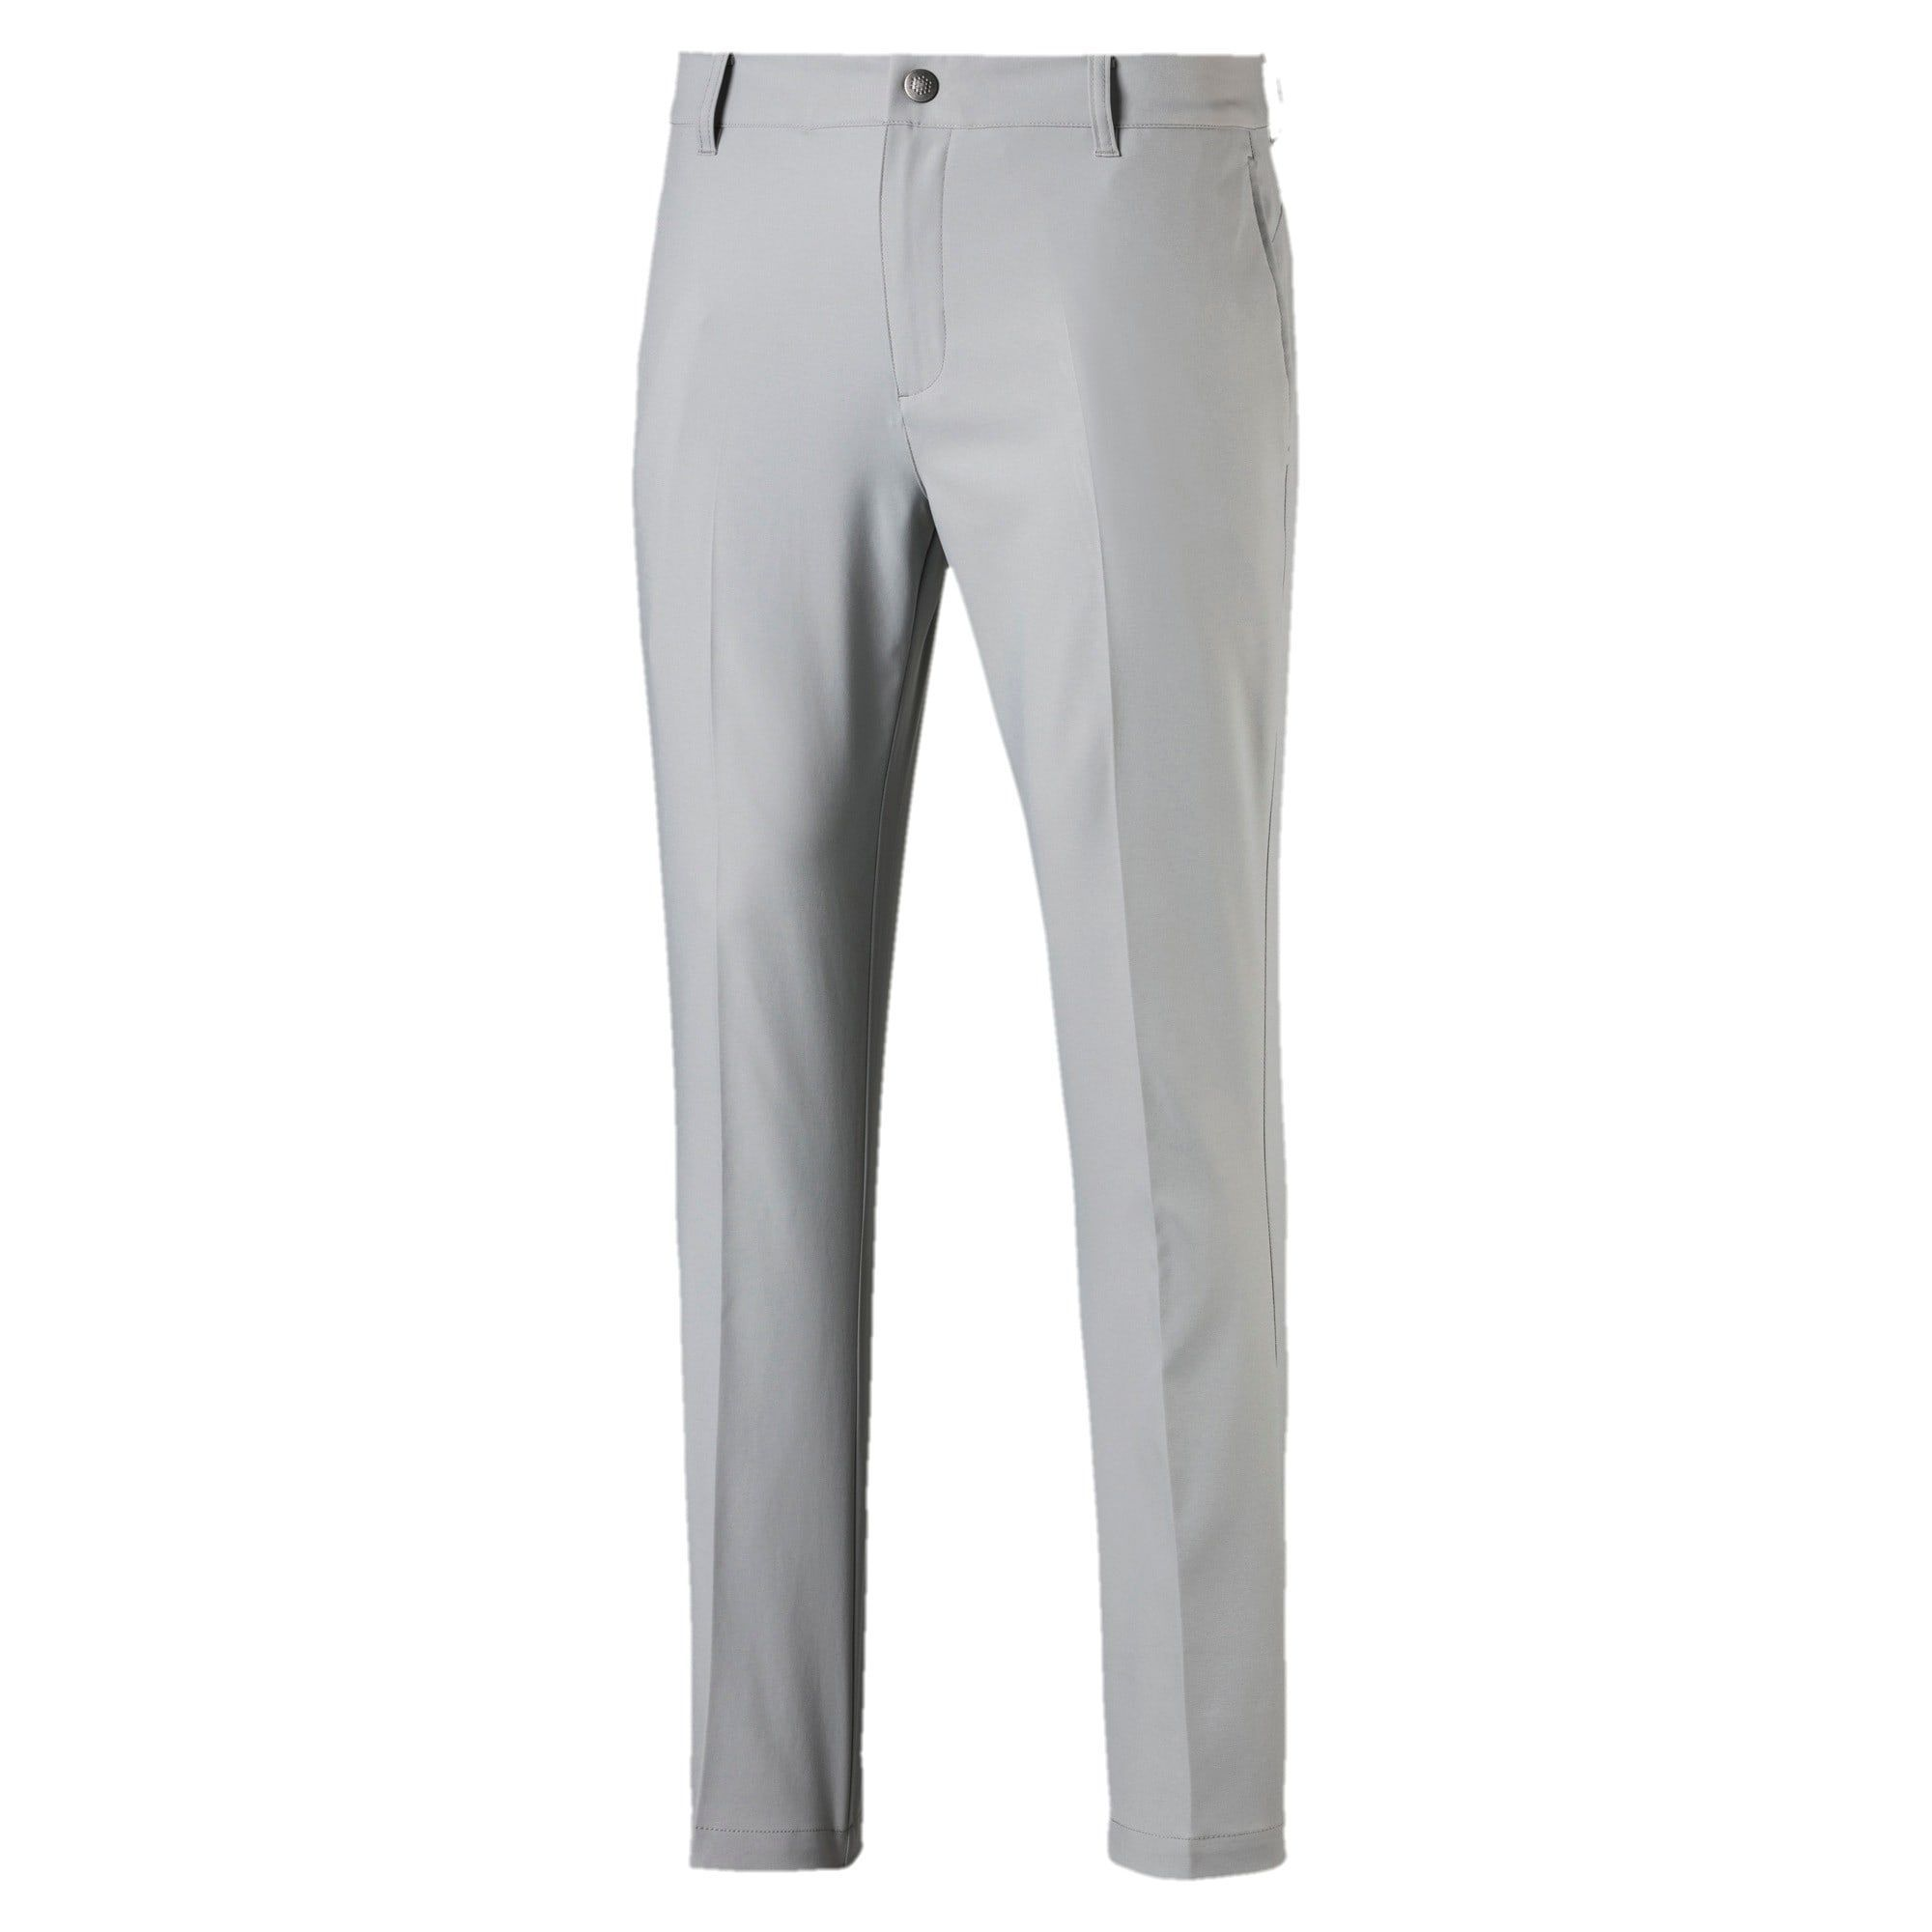 Tailored Jackpot Woven Men S Golf Pants Quarry Puma Spec Tailored Jackpot Woven Men S Golf Pants Quarry P In 2020 Golf Pants Fashion Clothes Women Men Logo